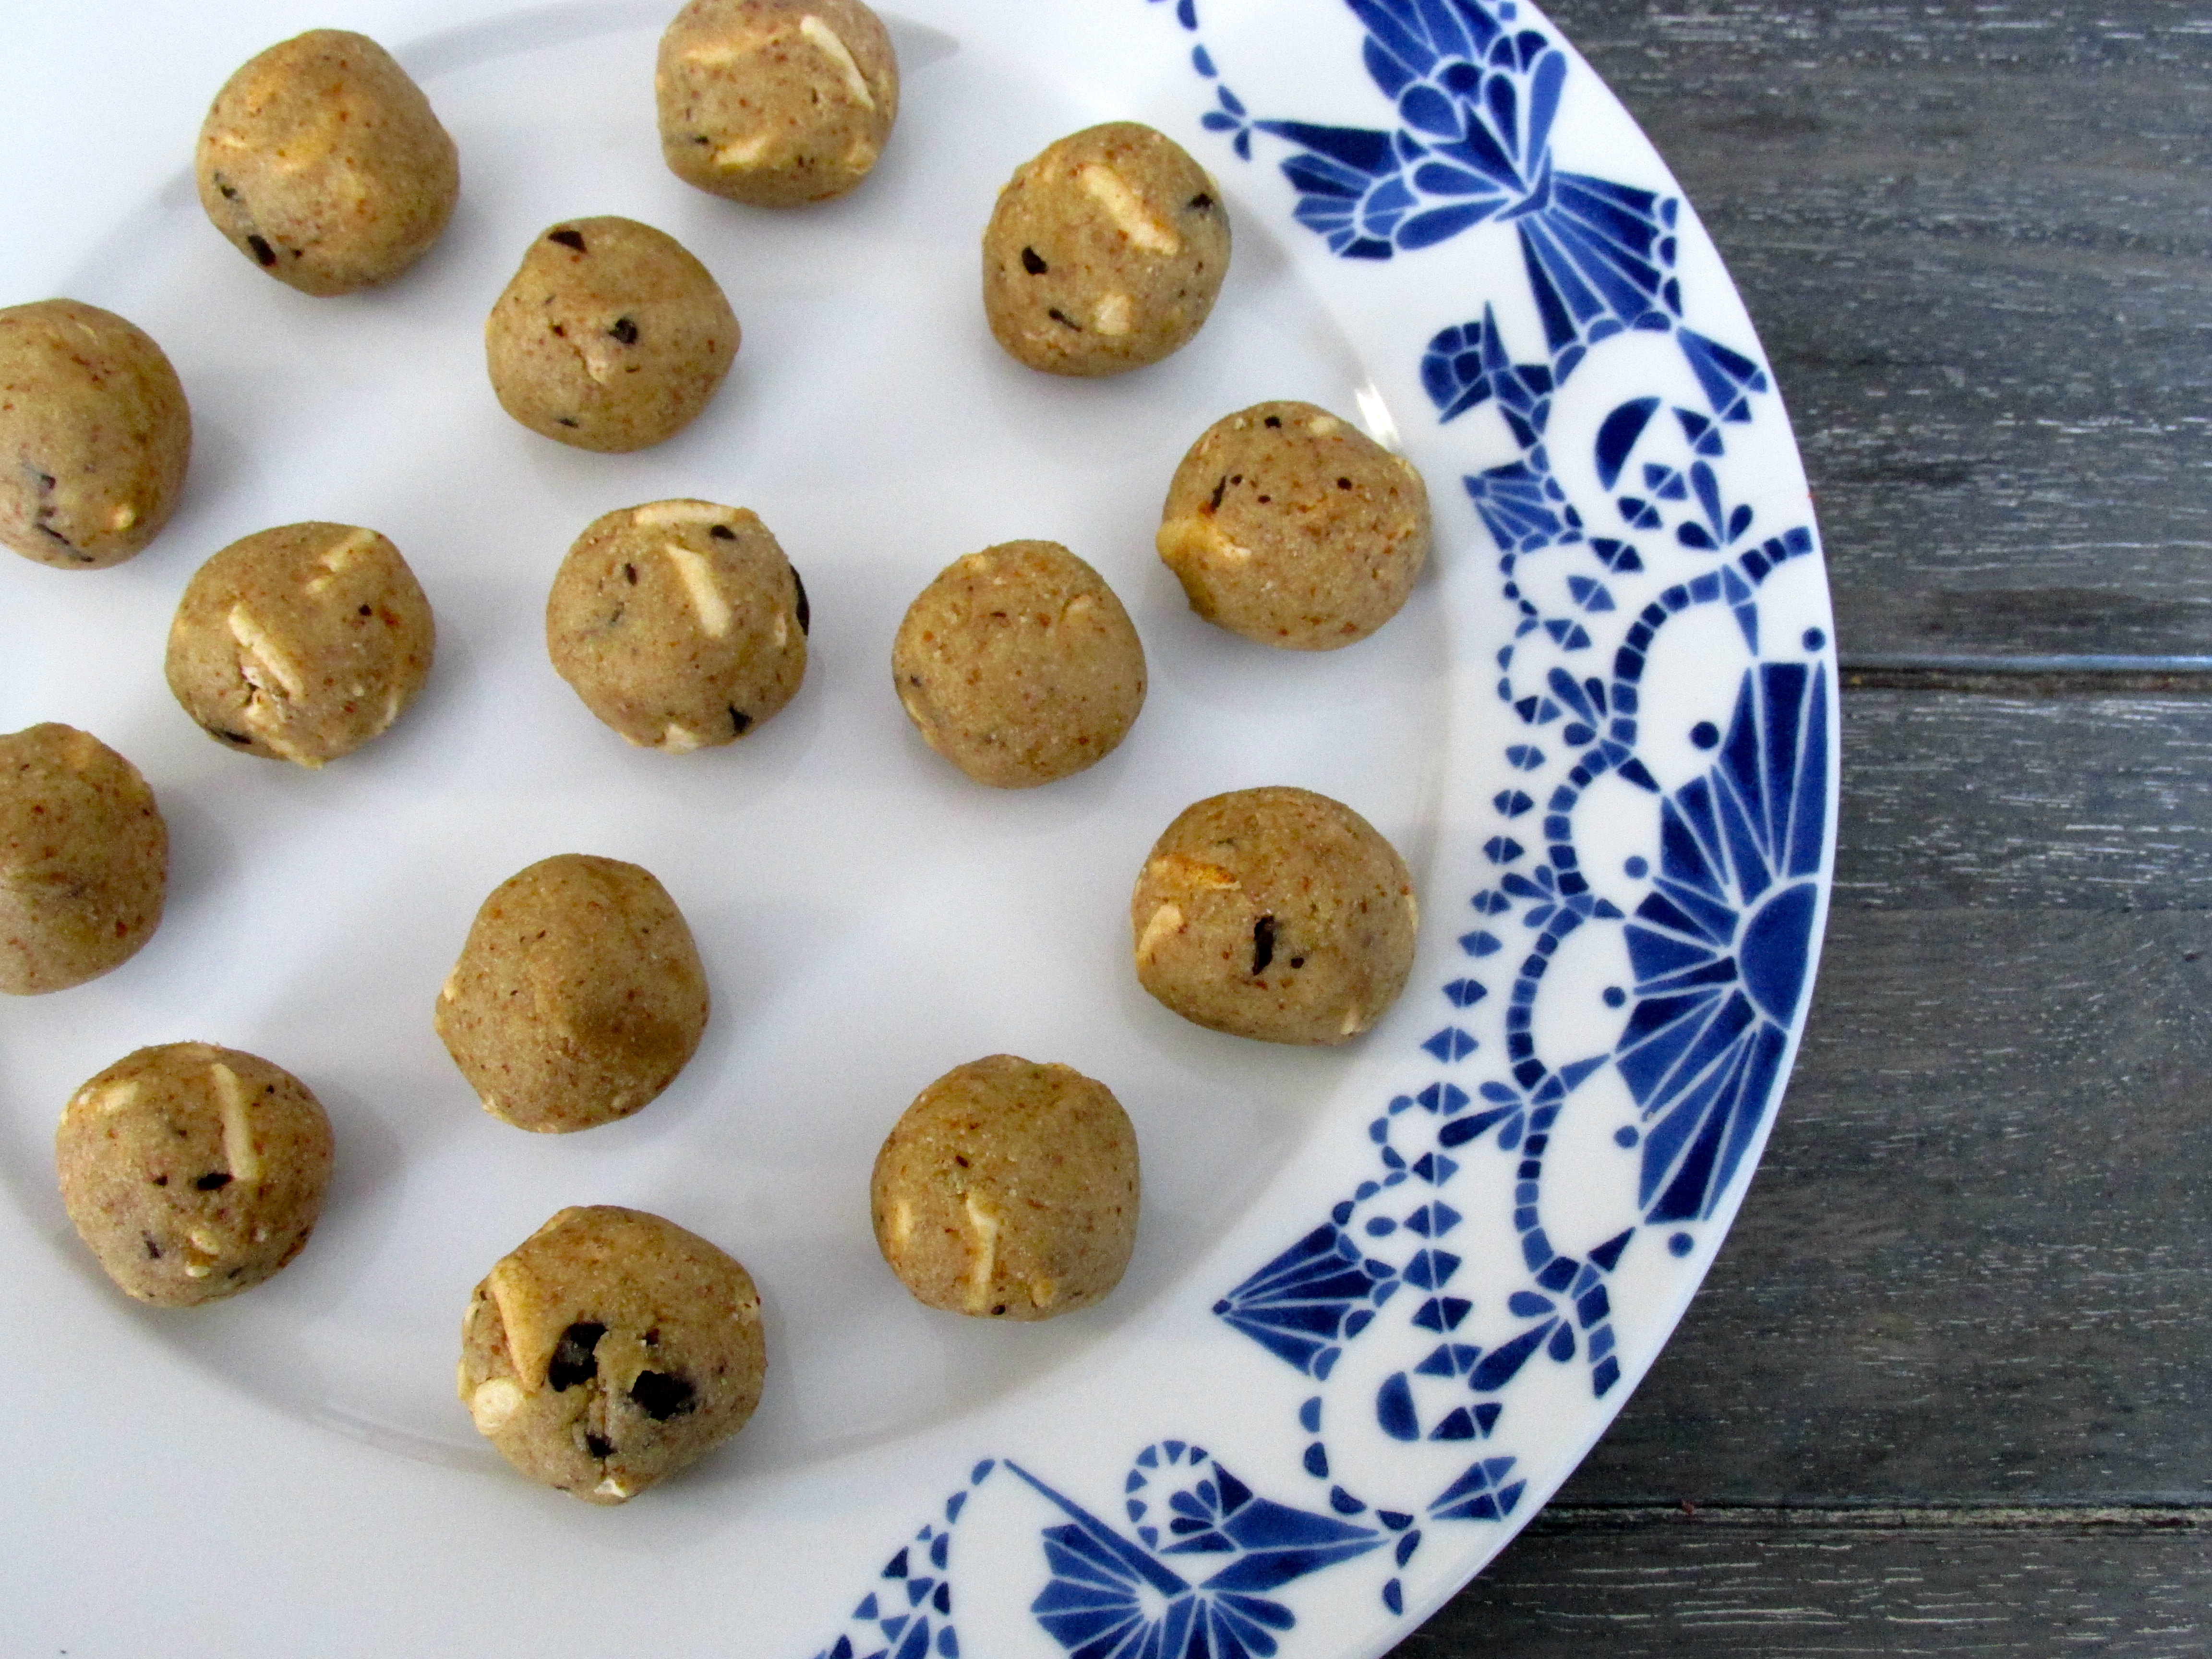 Raw Chocolate Chip Cookie Dough Balls (gluten free, vegan)